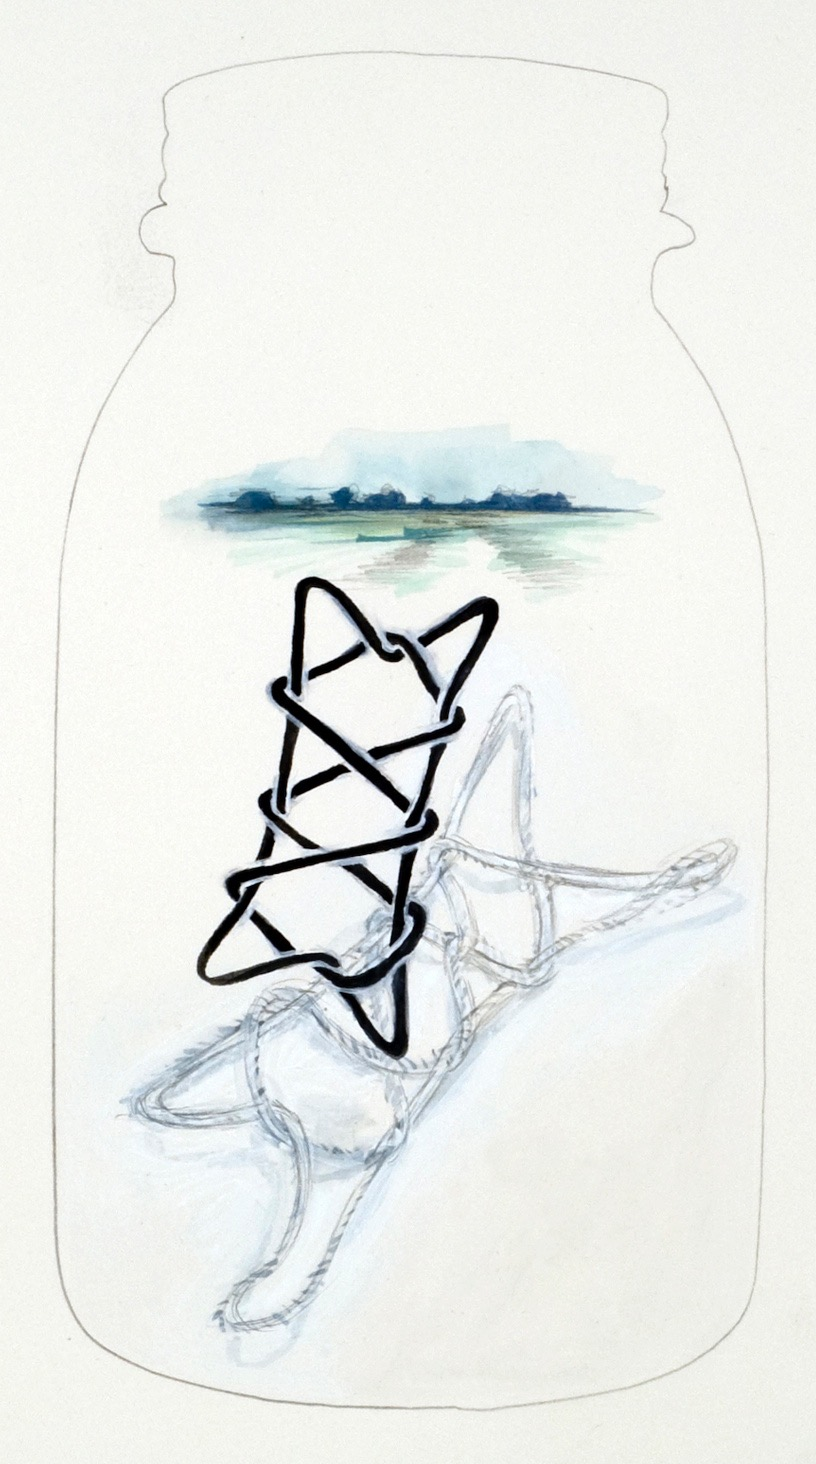 patoka hill 17, 2012  graphite, gouache and color pencil on paper  12 x 12 inches